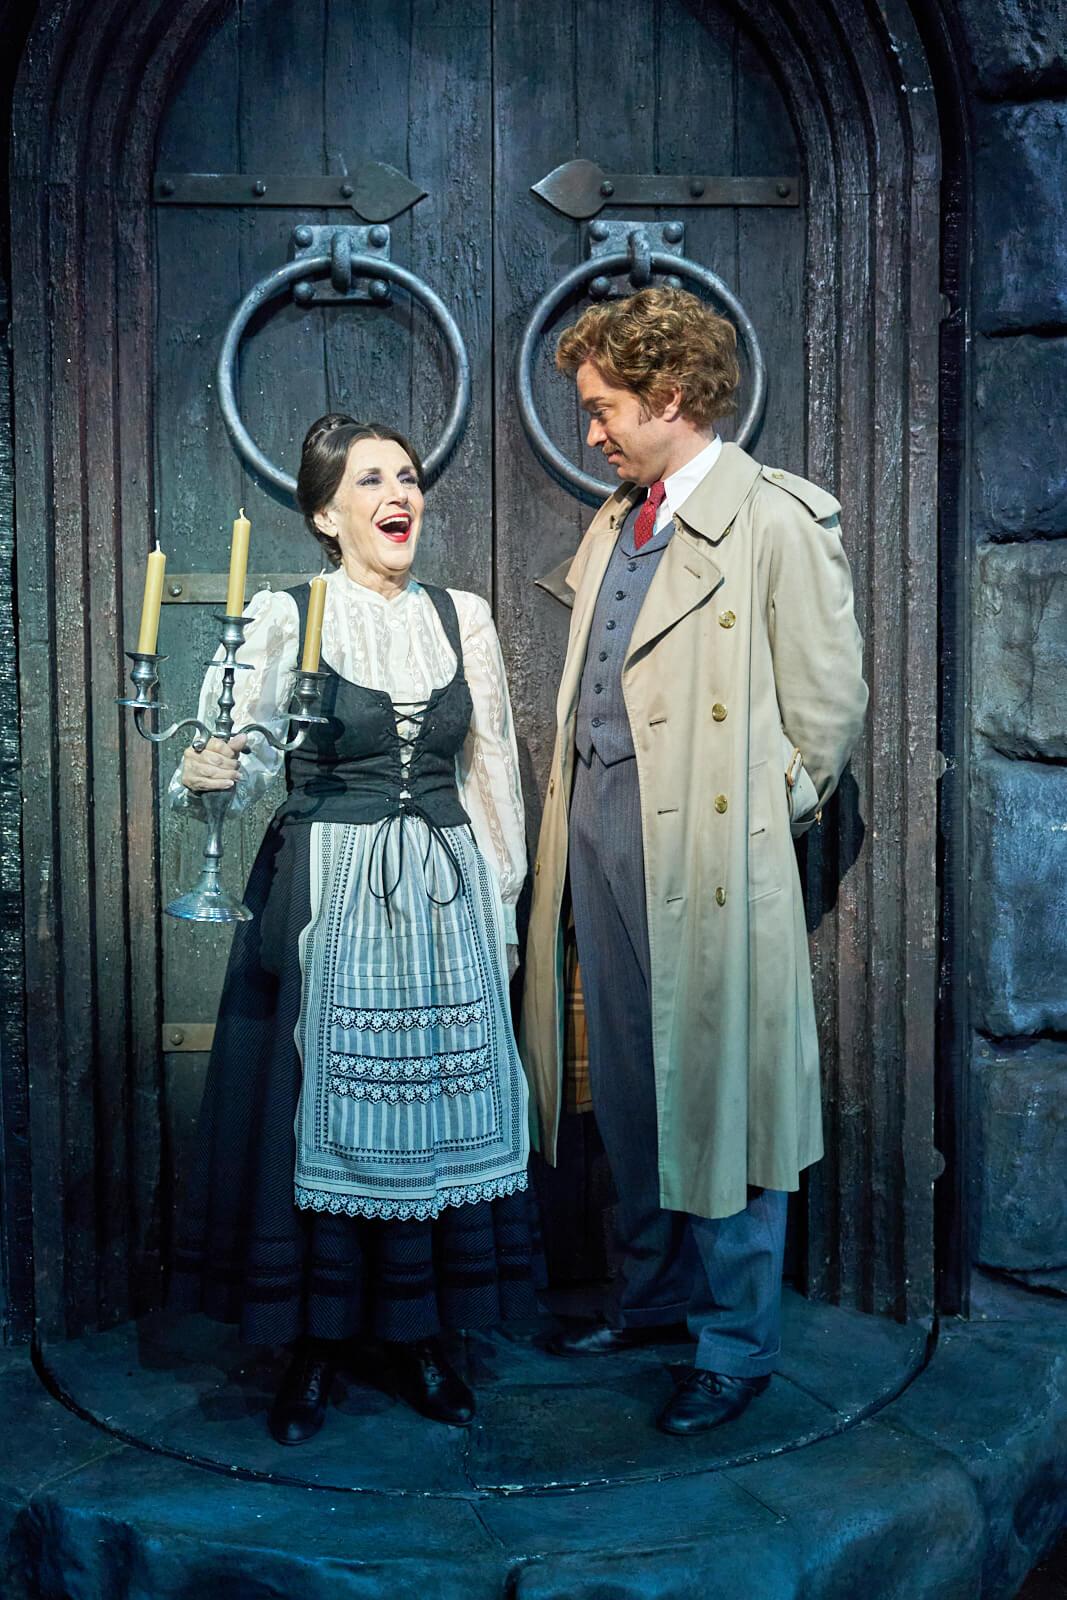 Frau Blucher(Lesley Joseph) laughing at Dr. Frankenstein (Hadley Fraser) in front of castle doors.